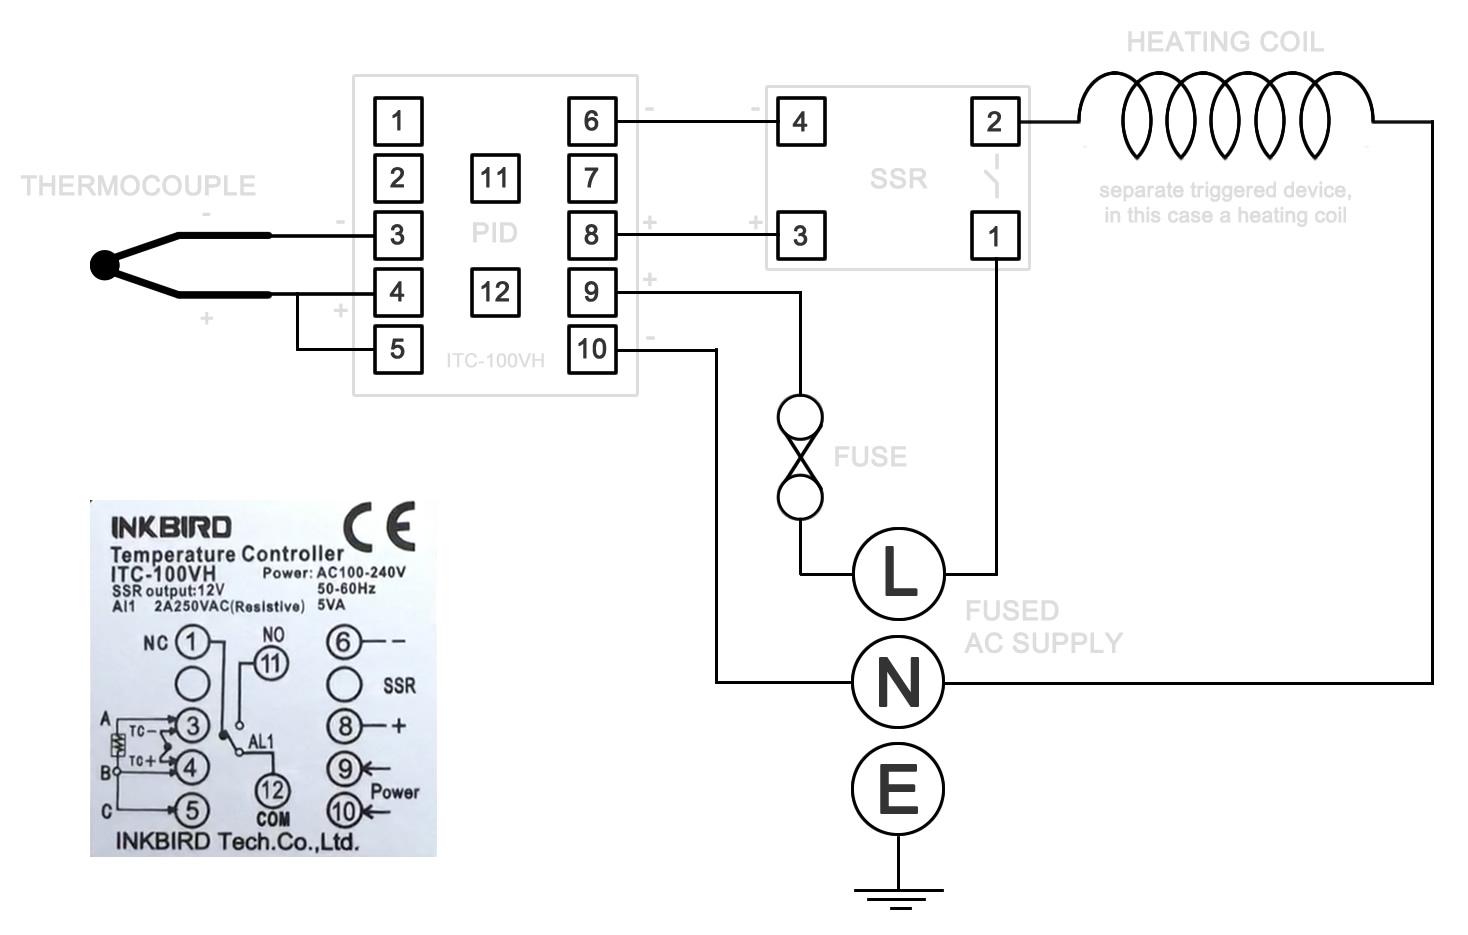 PID wiring diagram credit to https://www.vegoilguy.co.uk/pid.php